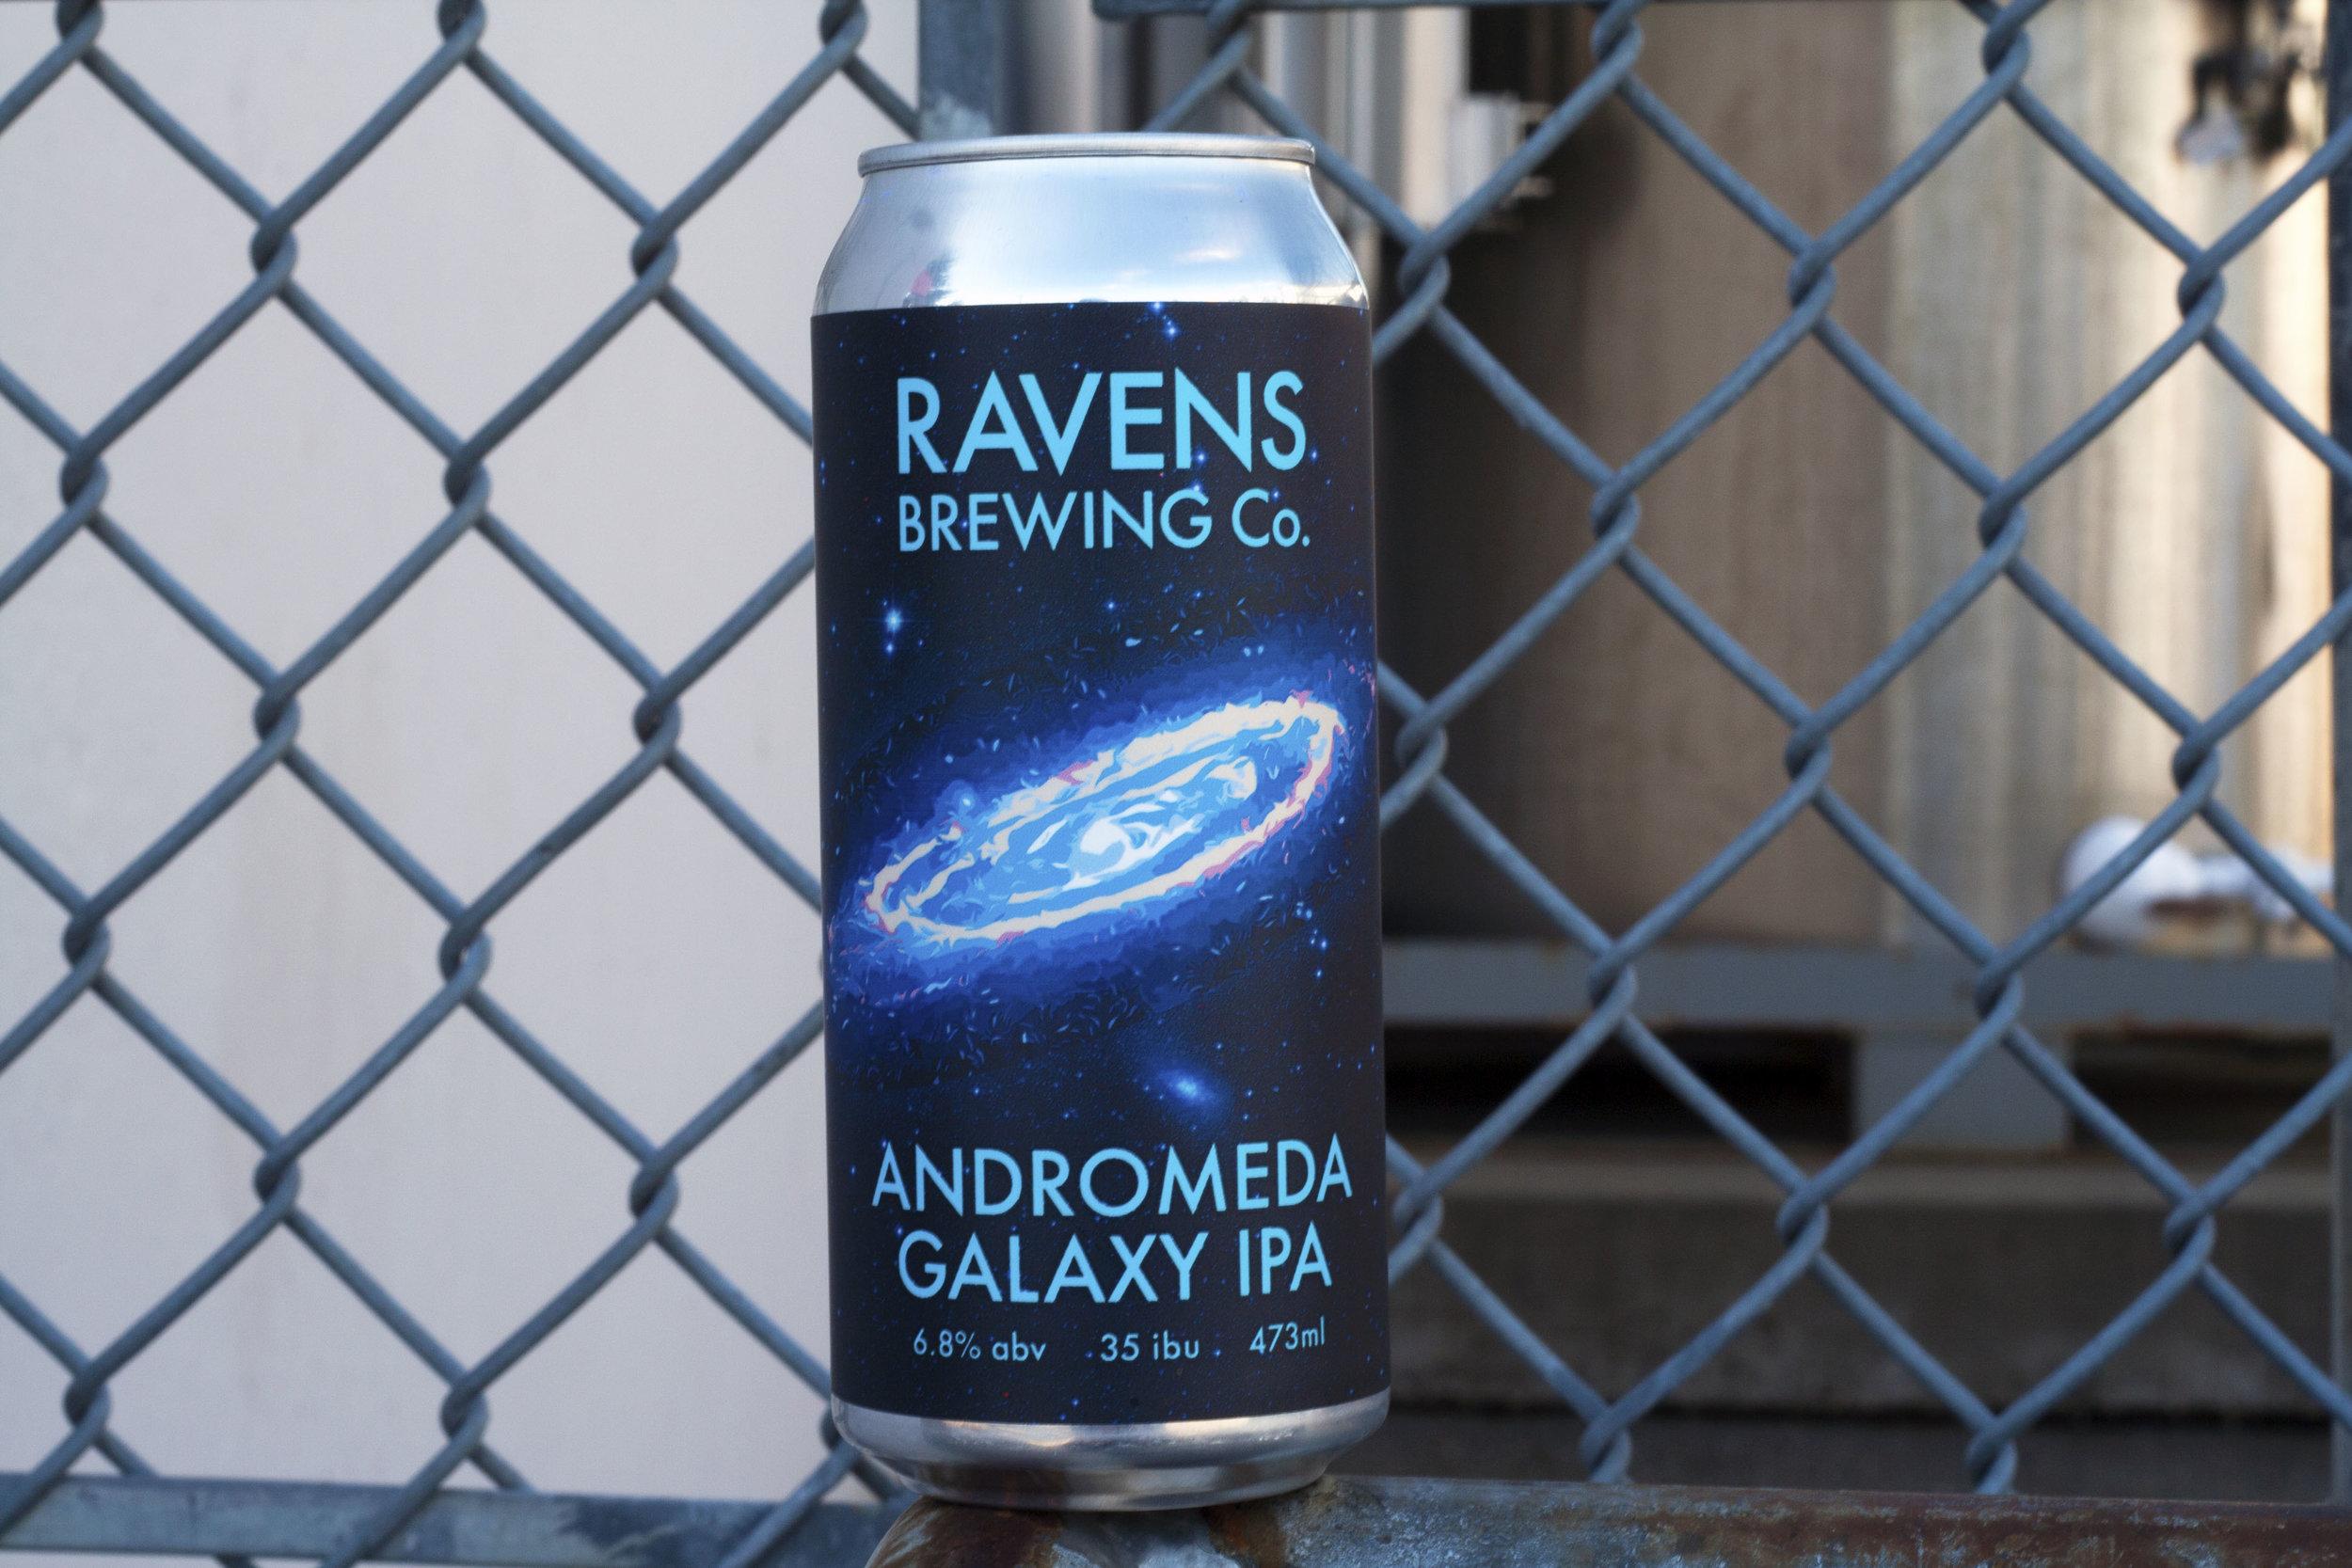 Andromeda 1.jpg